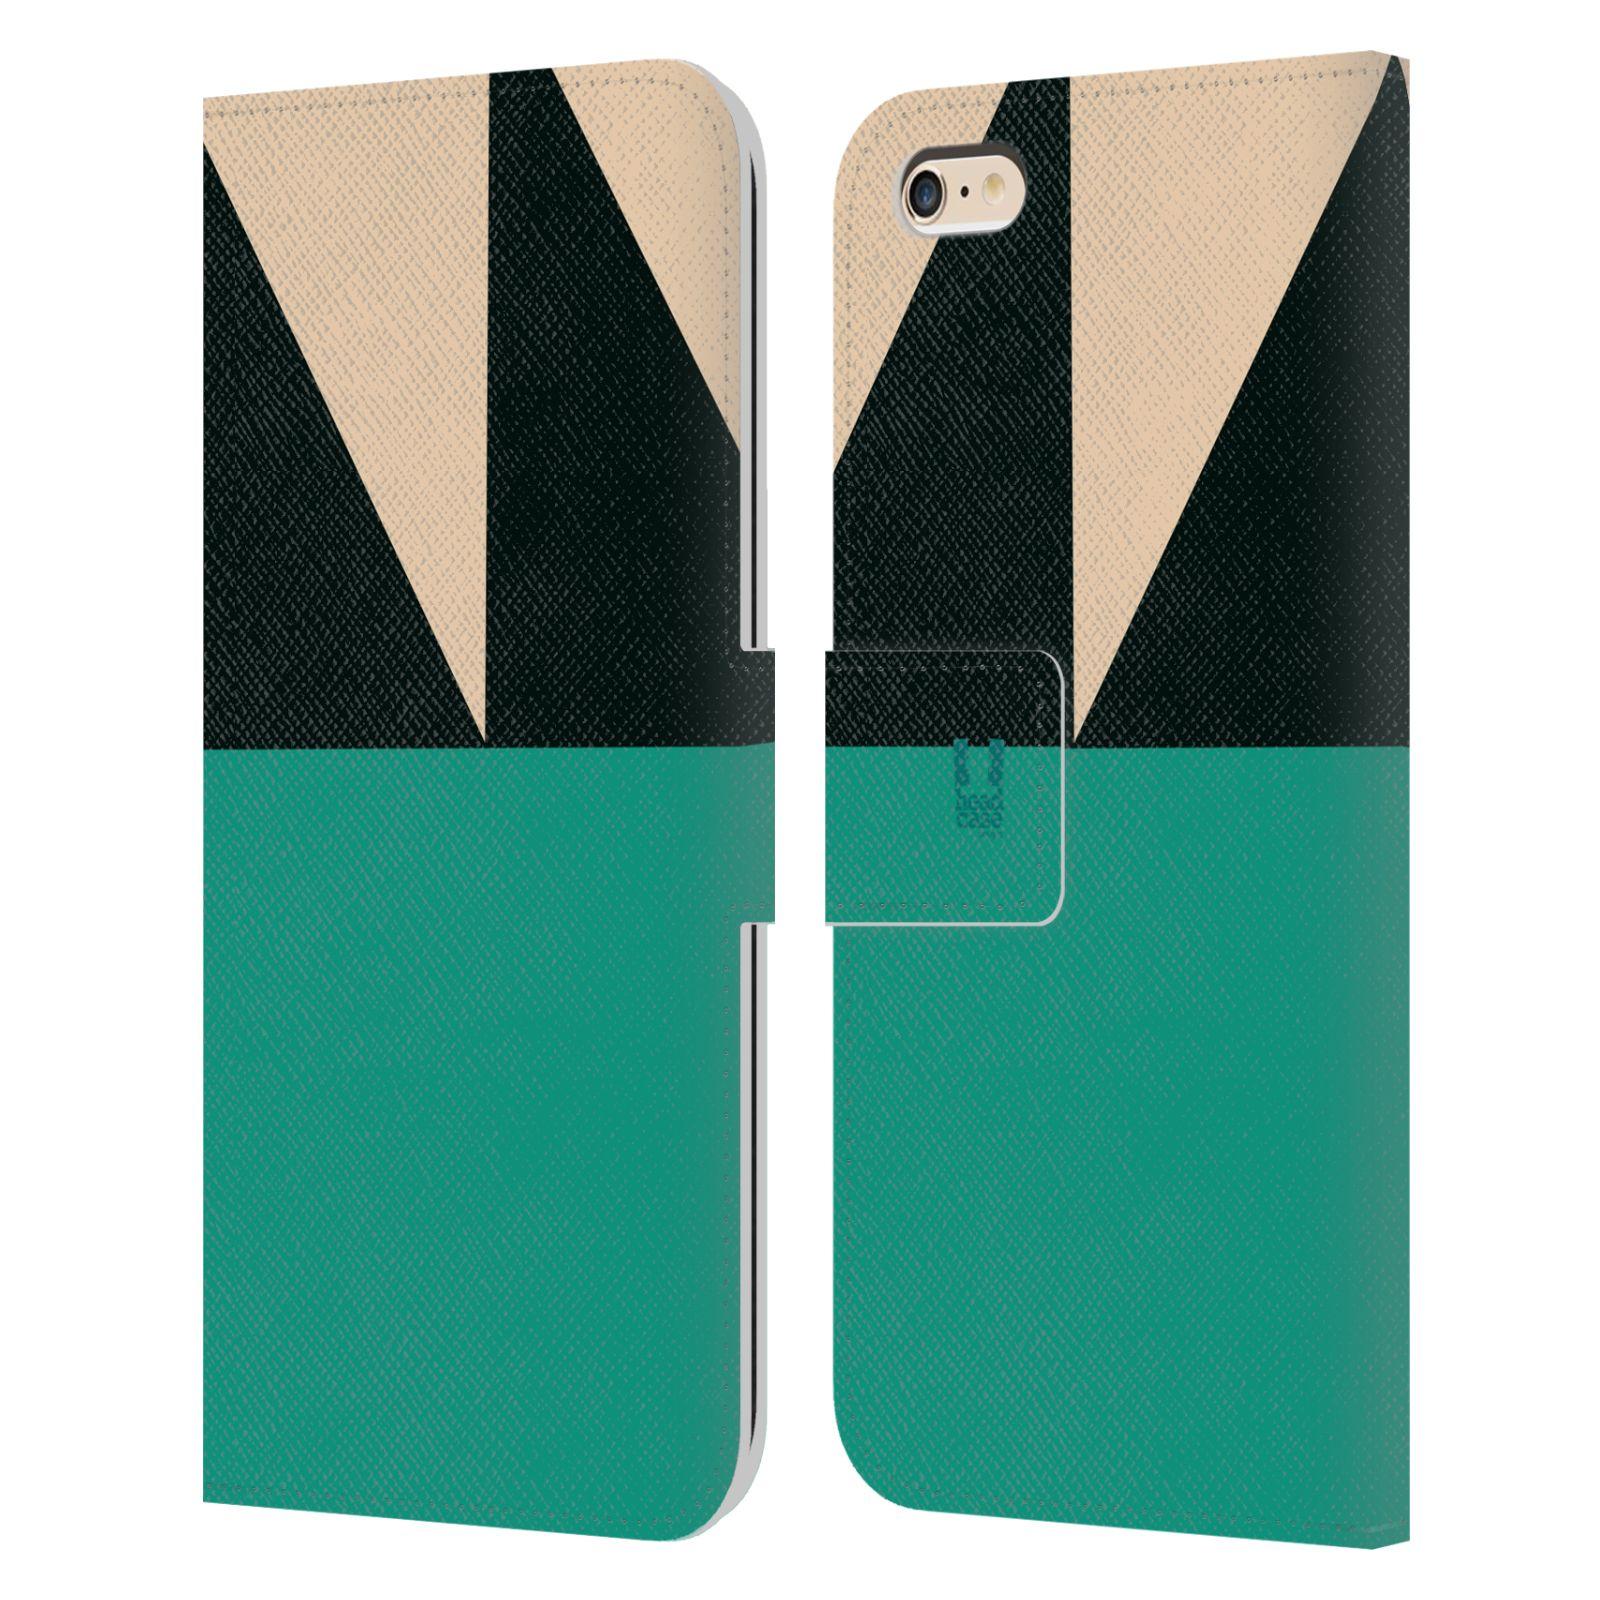 HEAD CASE Flipové pouzdro pro mobil Apple Iphone 6 PLUS/6S PLUS barevné tvary moře modrá